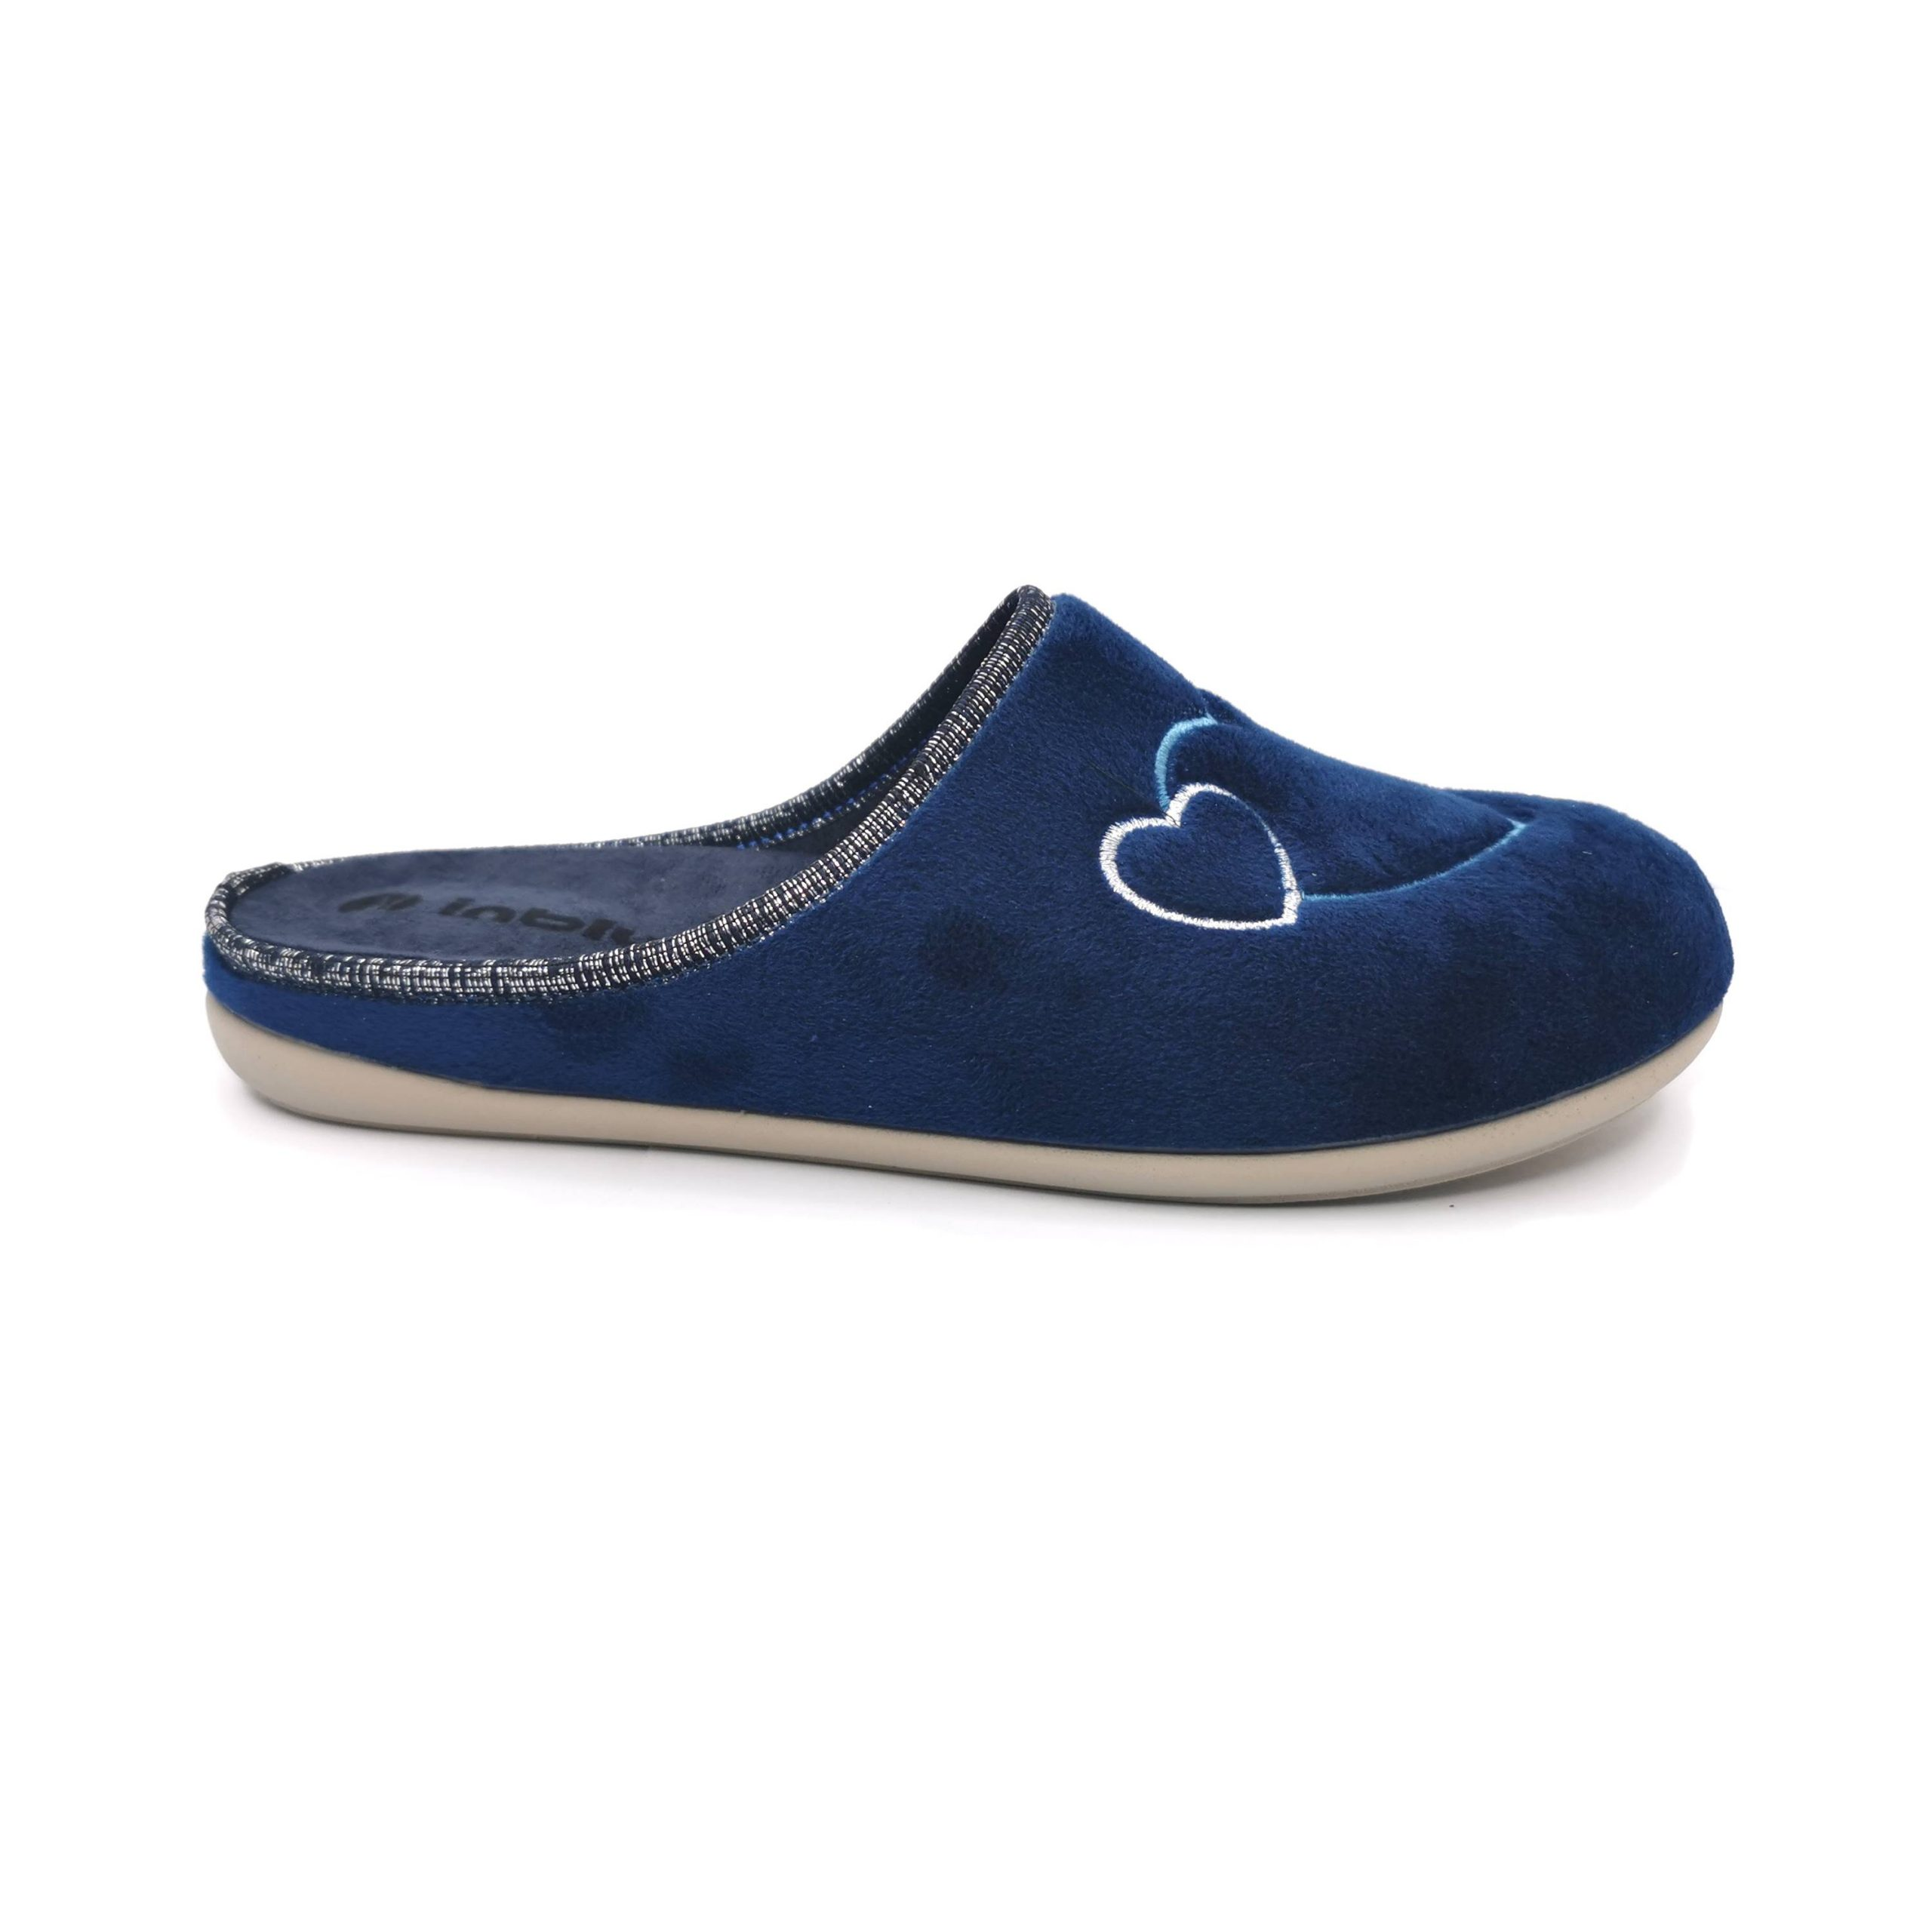 Inblu pantofola donna di colore blu con fantasia a cuori ricamati.